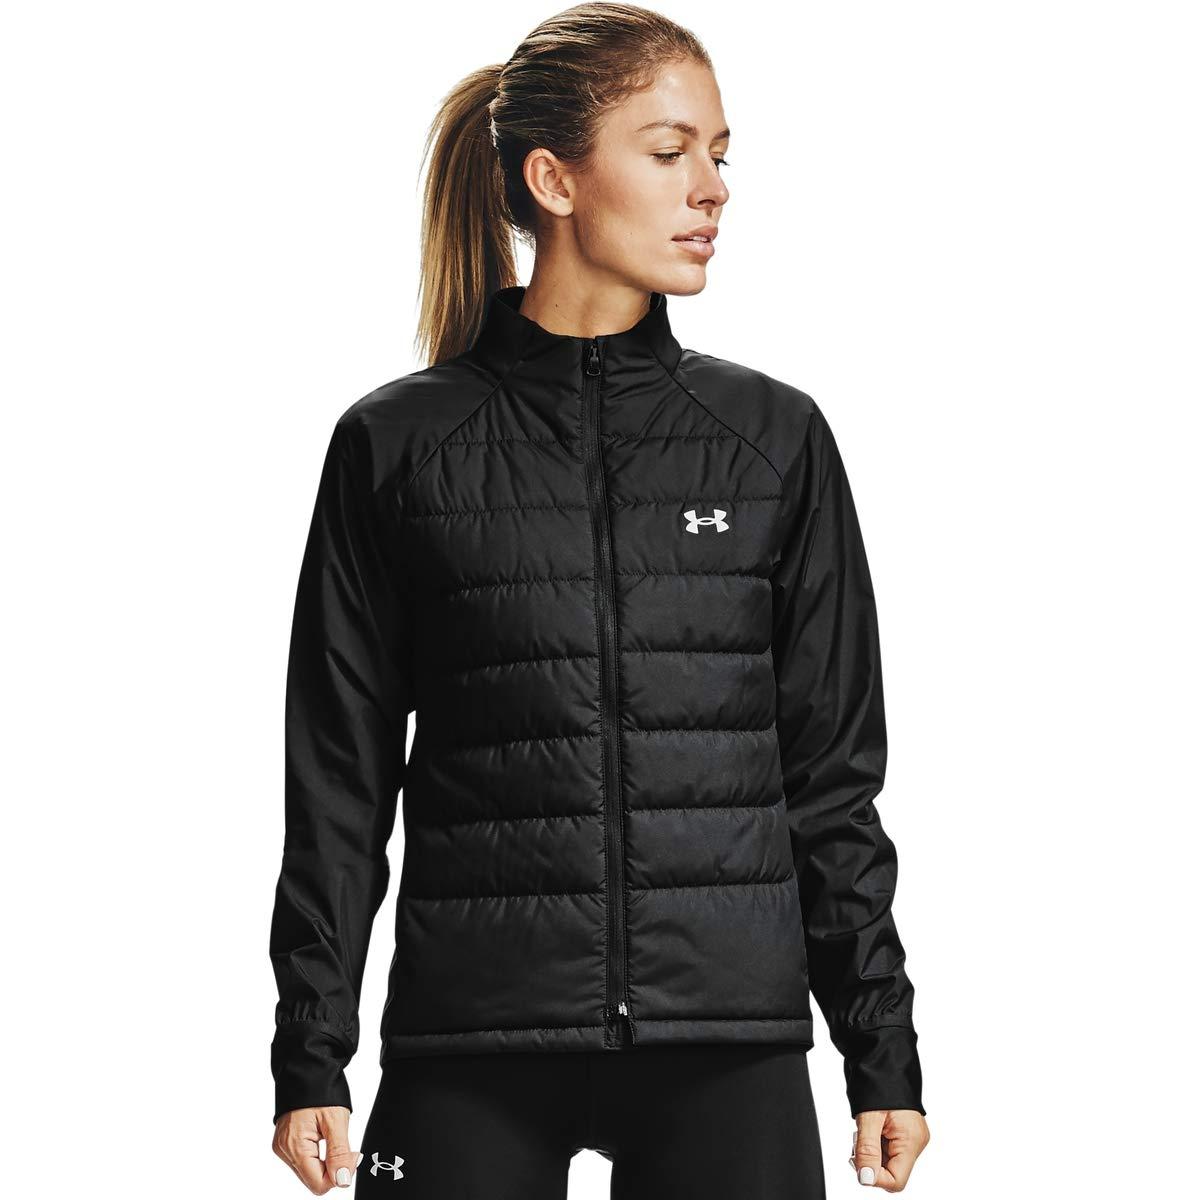 Under Armour Damen Run Insulate Hybrid Jacke, Black / / Reflective (001), XS